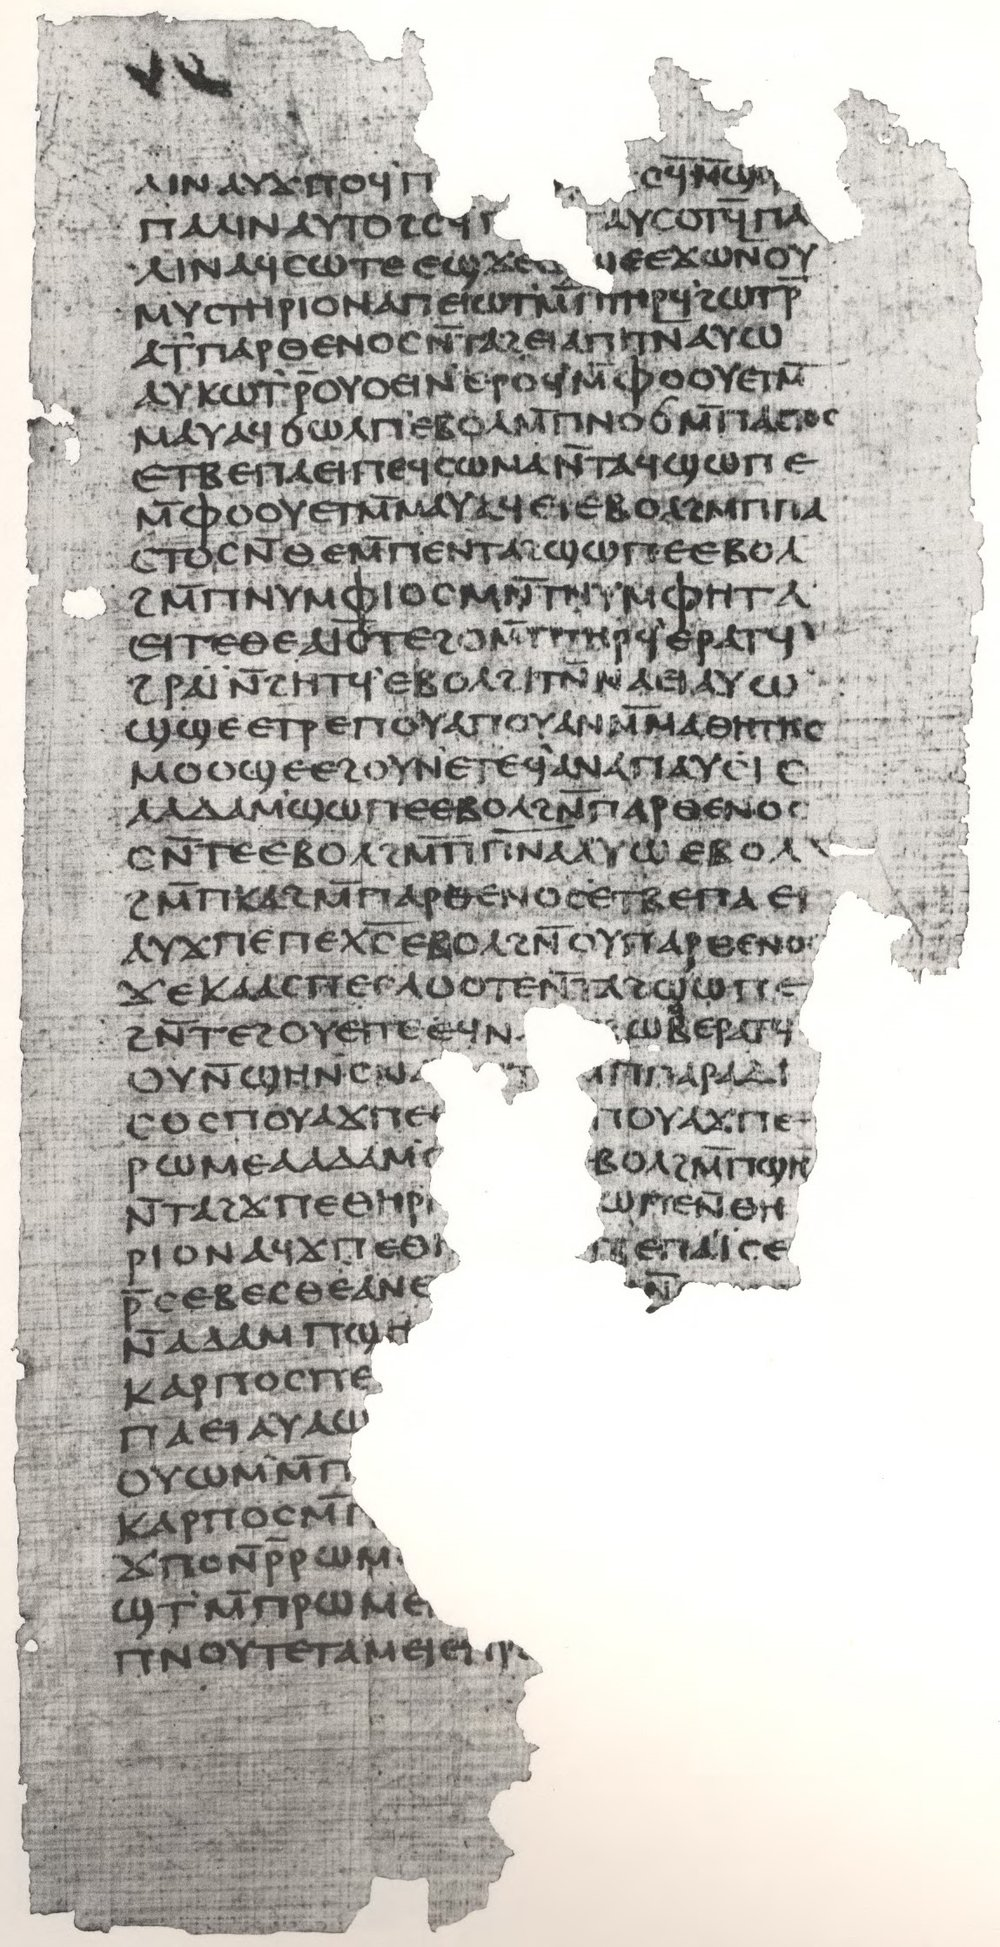 Gospel_of_Philip_facsimile_Page_71.jpg